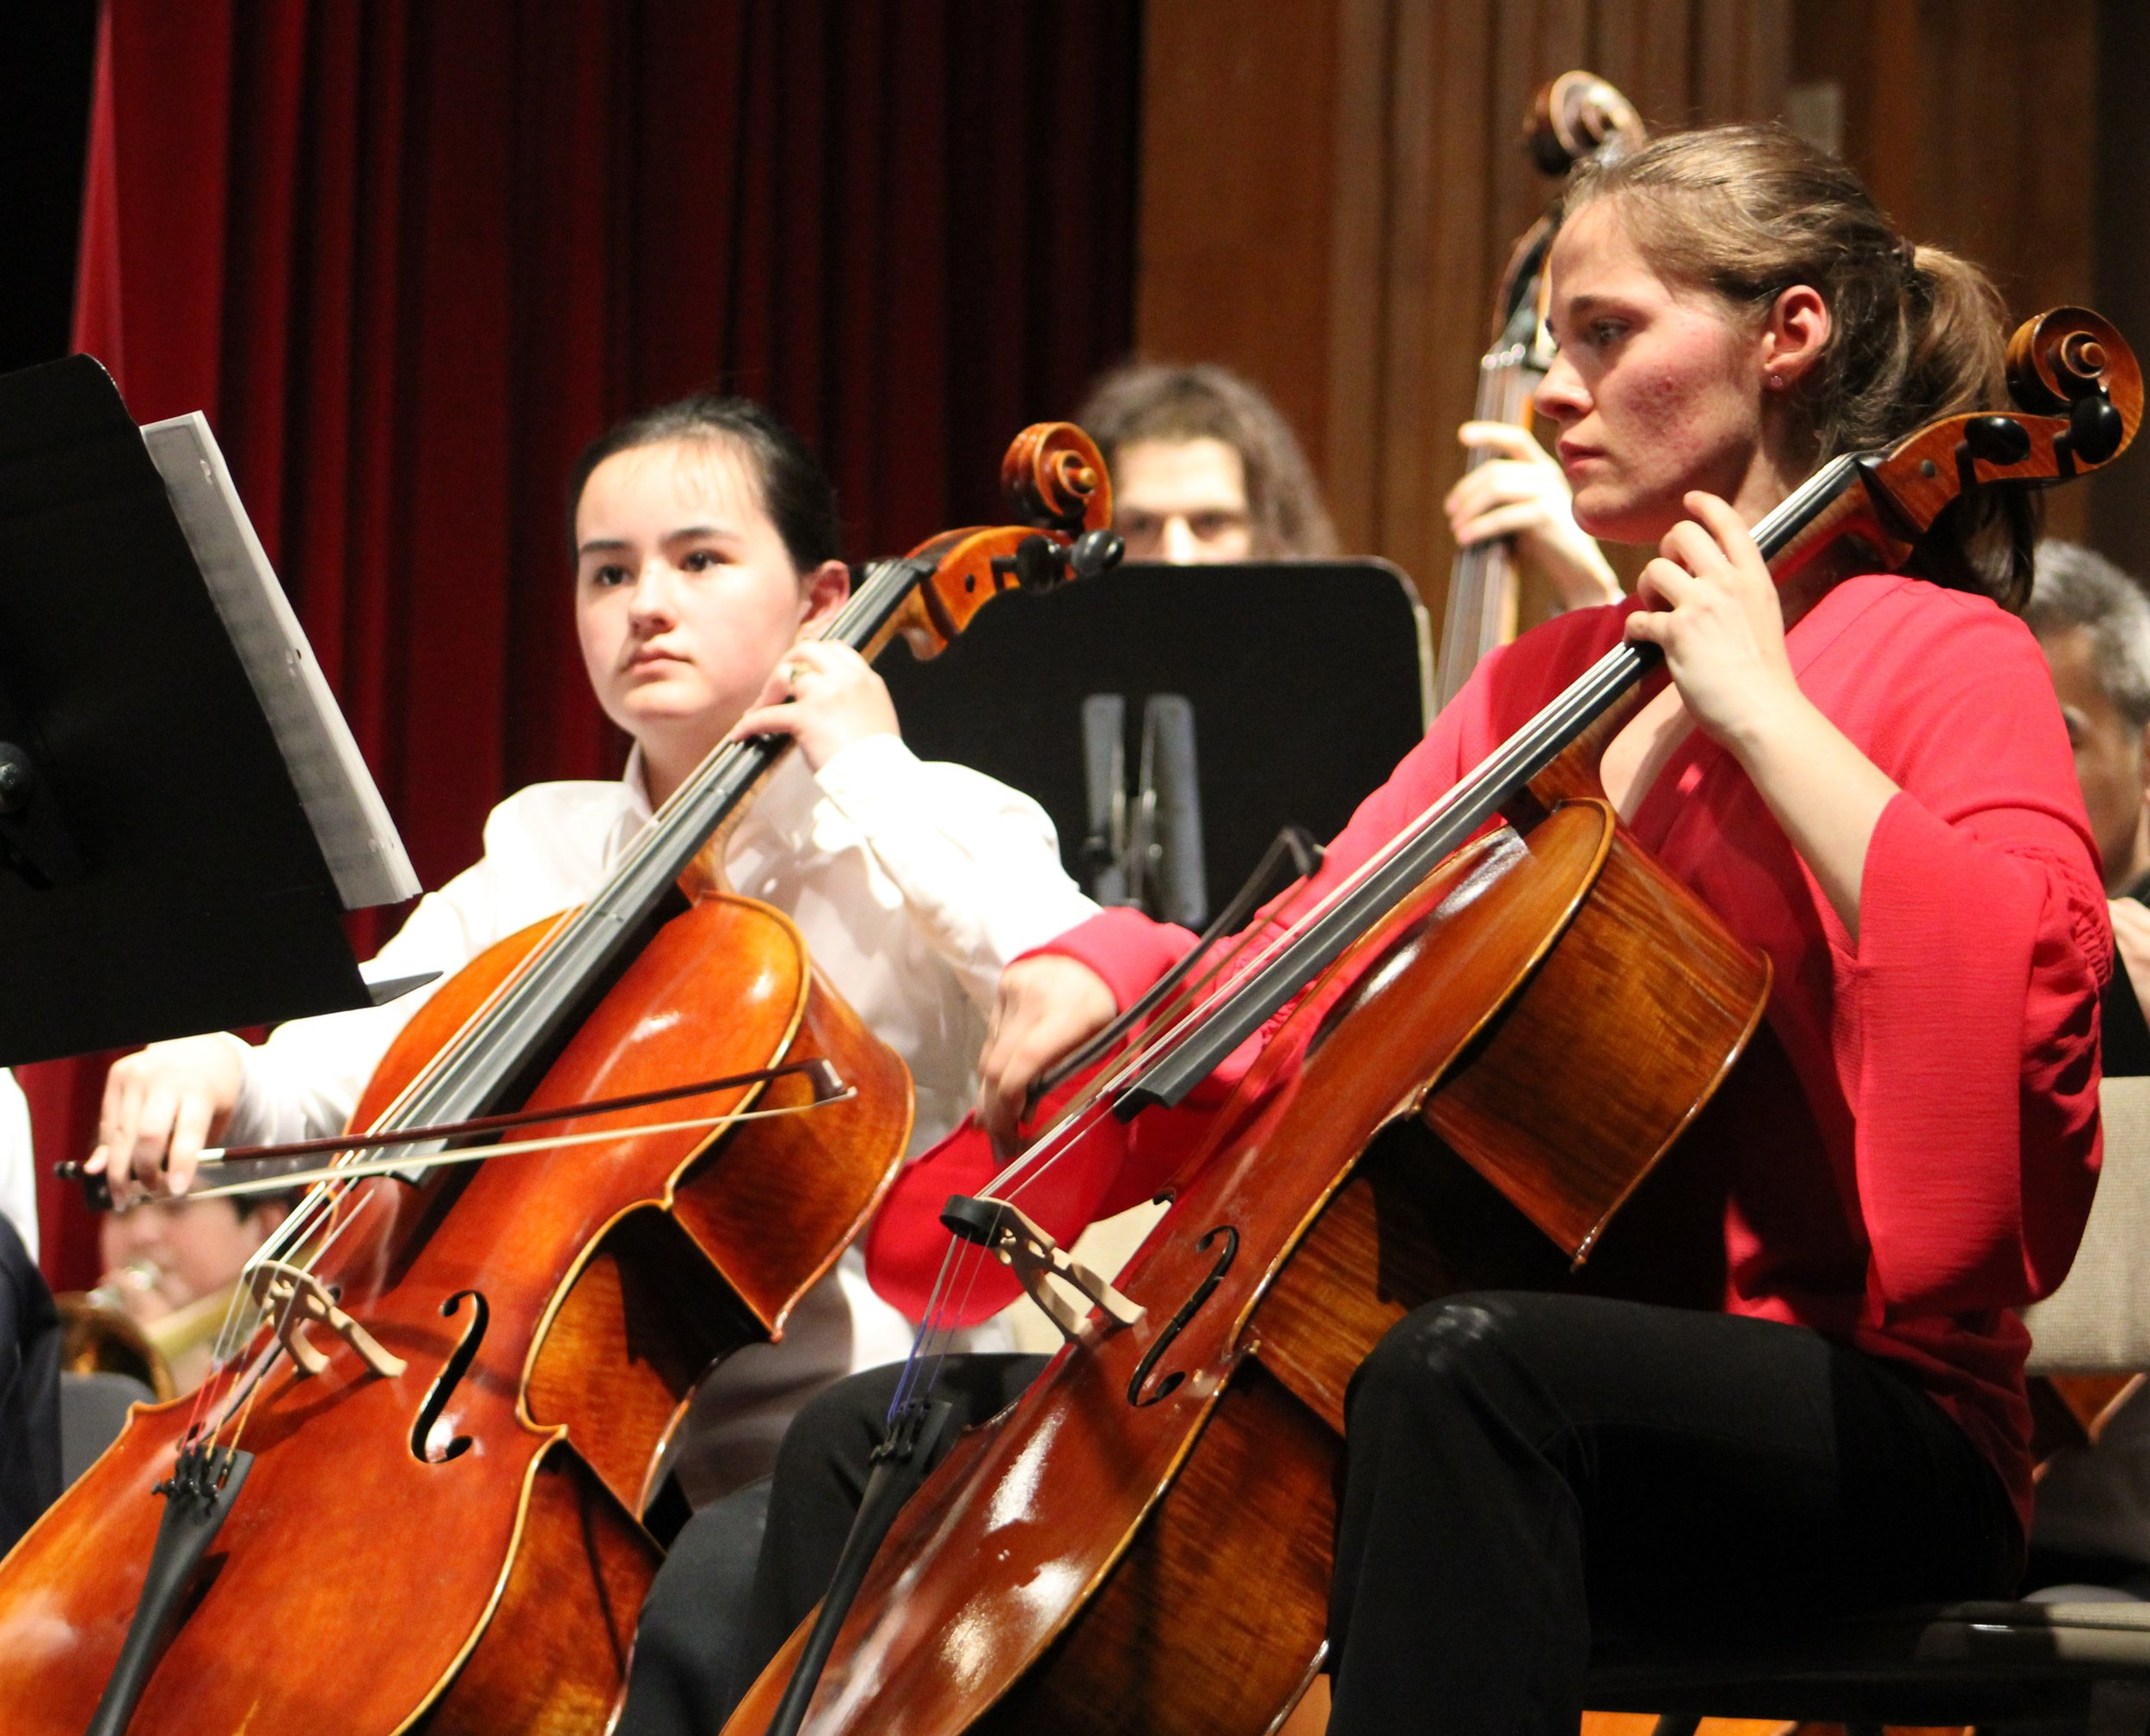 CHYS Spring Concert 5 cellos JPG.jpg